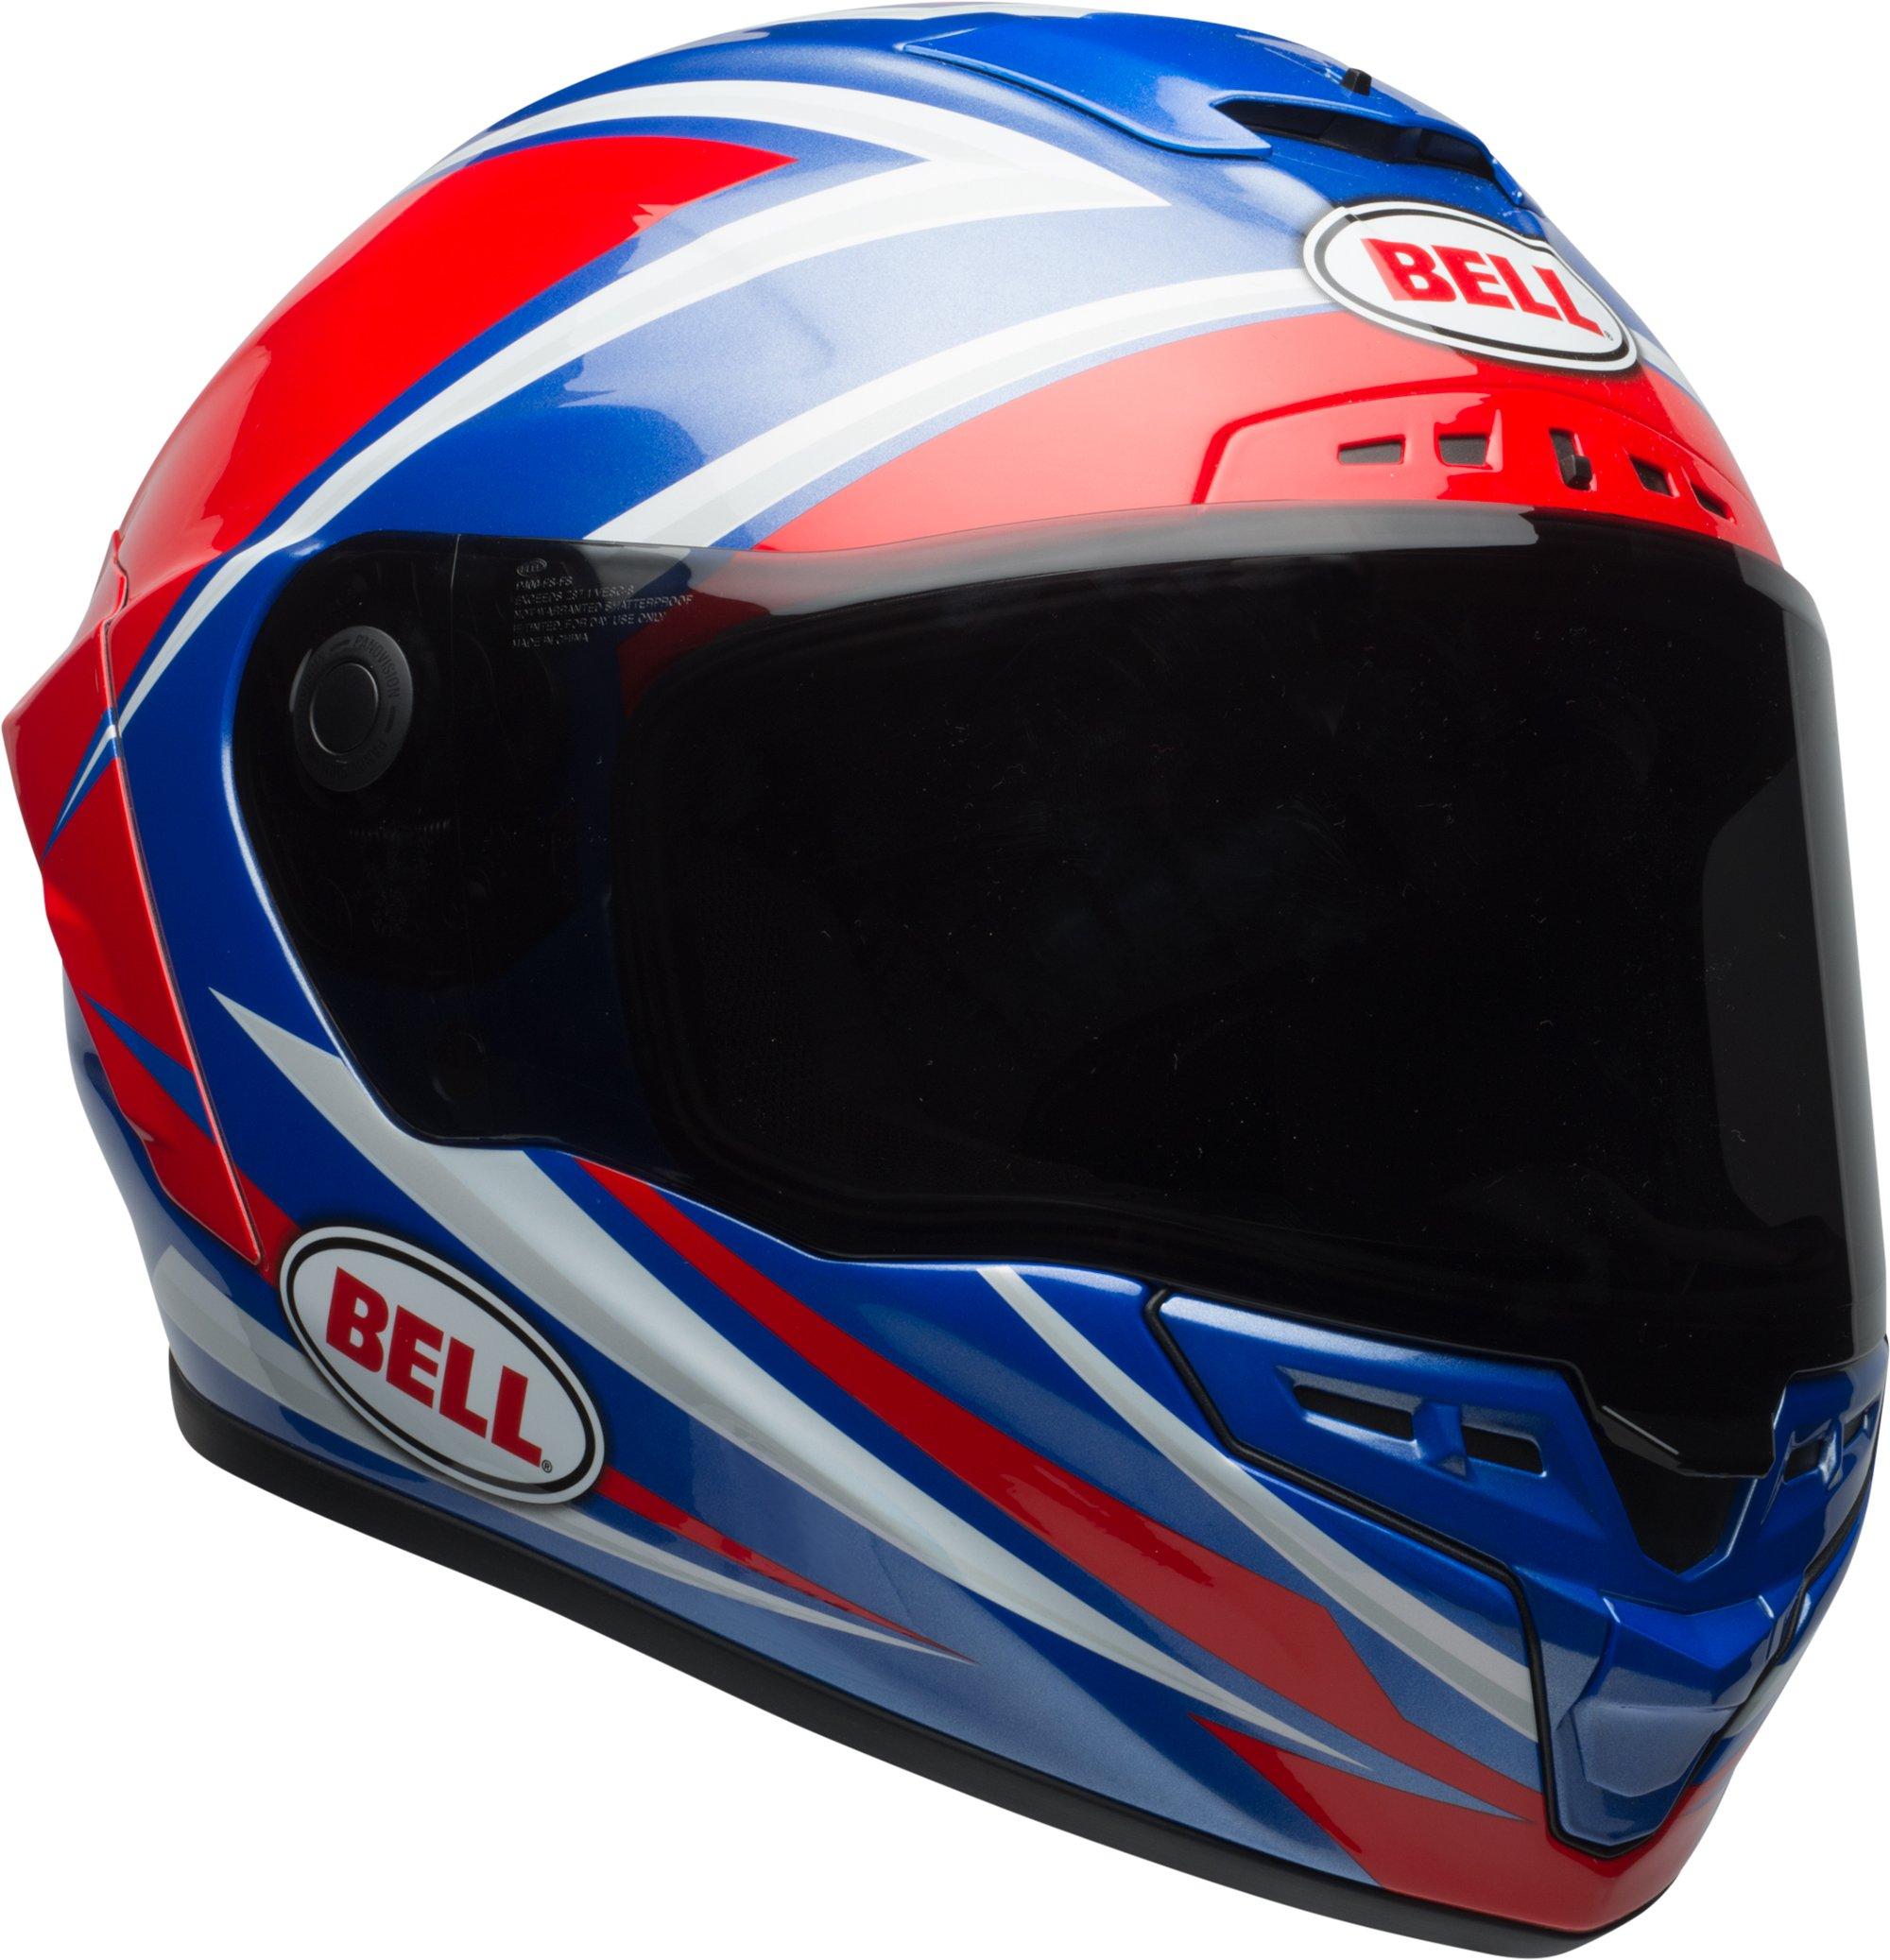 Bell Star MIPS Torsion Motorcycle Helmet (Red / Blue - X-Large)